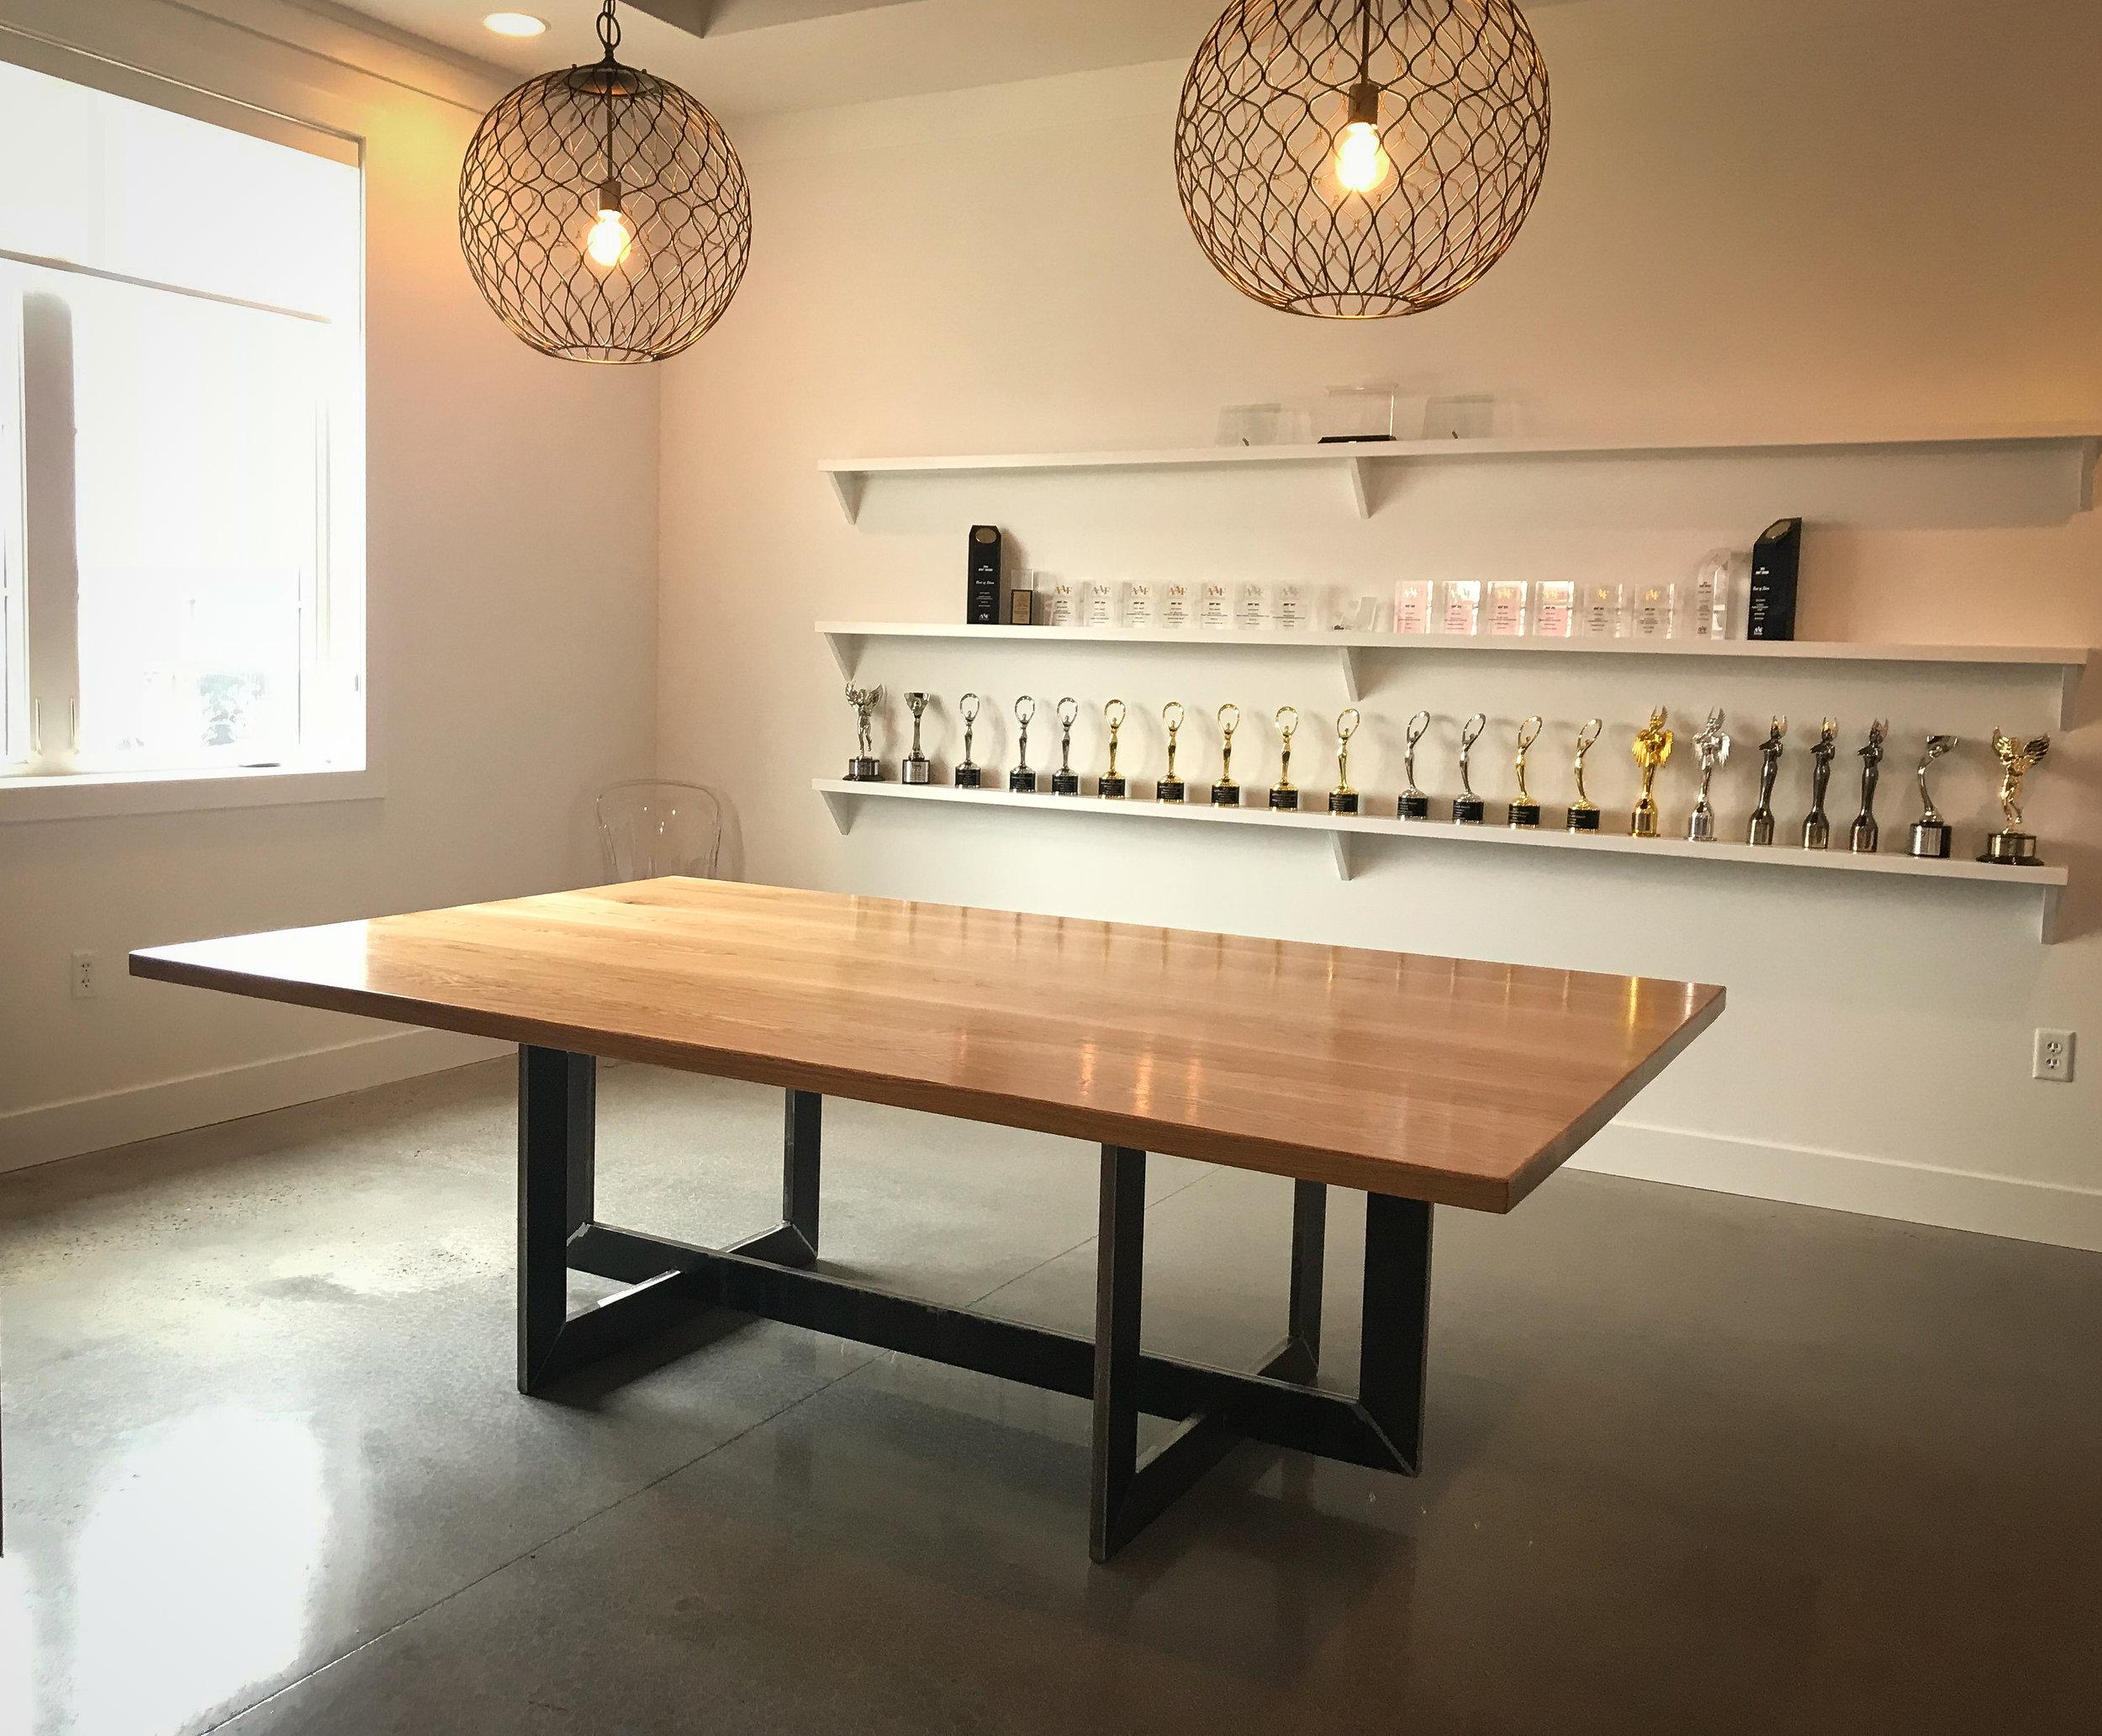 bespoke furniture, custom handmade conference table